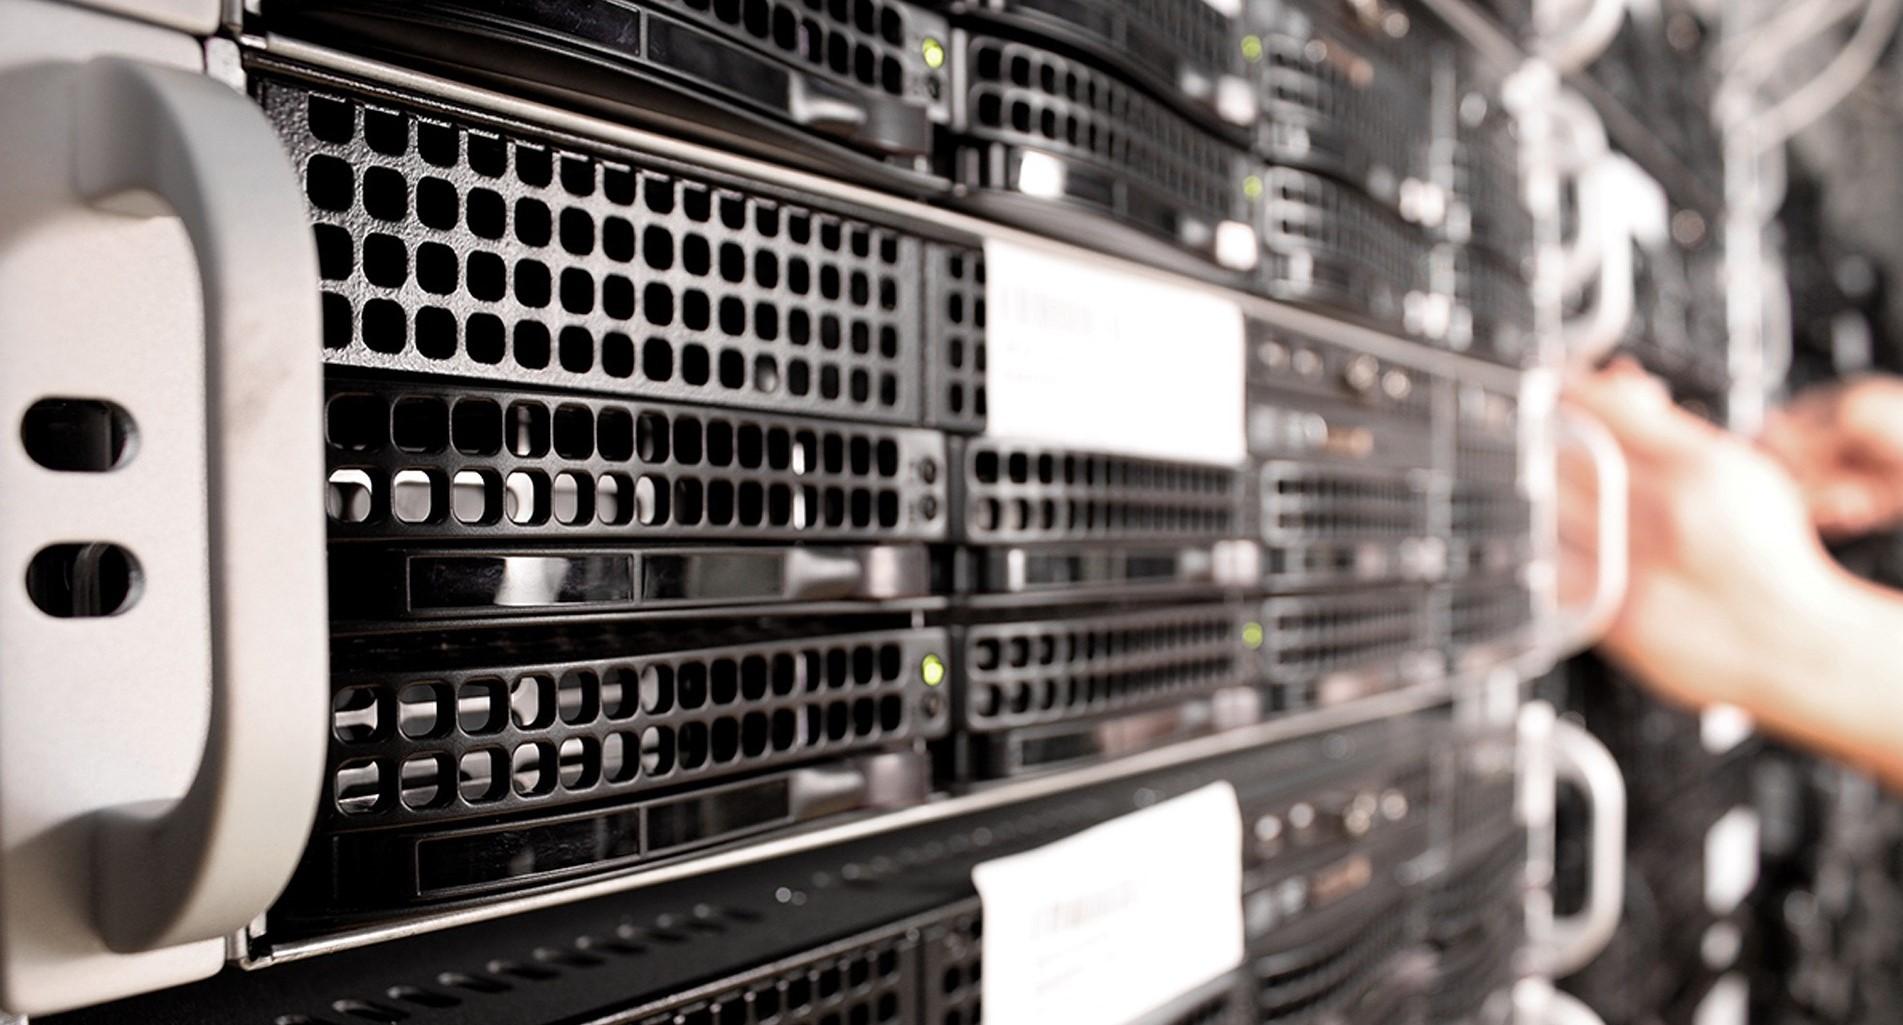 Identify the databases containing ePHI